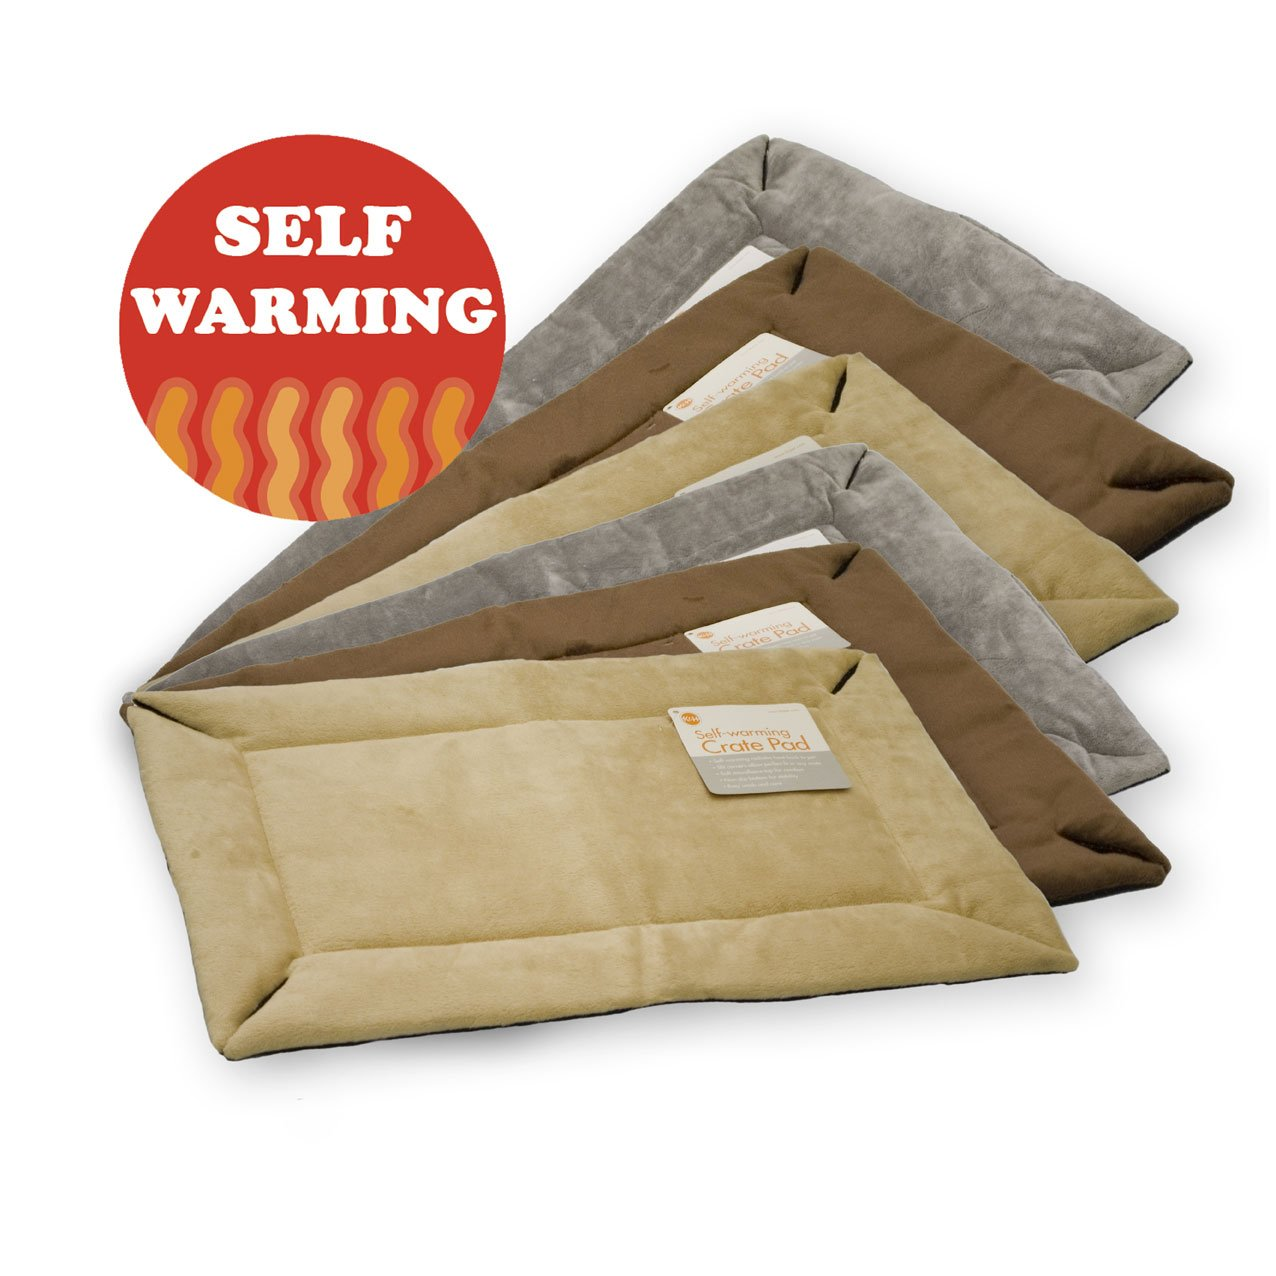 Cuccia per Cane Cuscino Auto-riscaldante per Gabbia Self-Warming Crate Pad K/&H Pet Extra Small